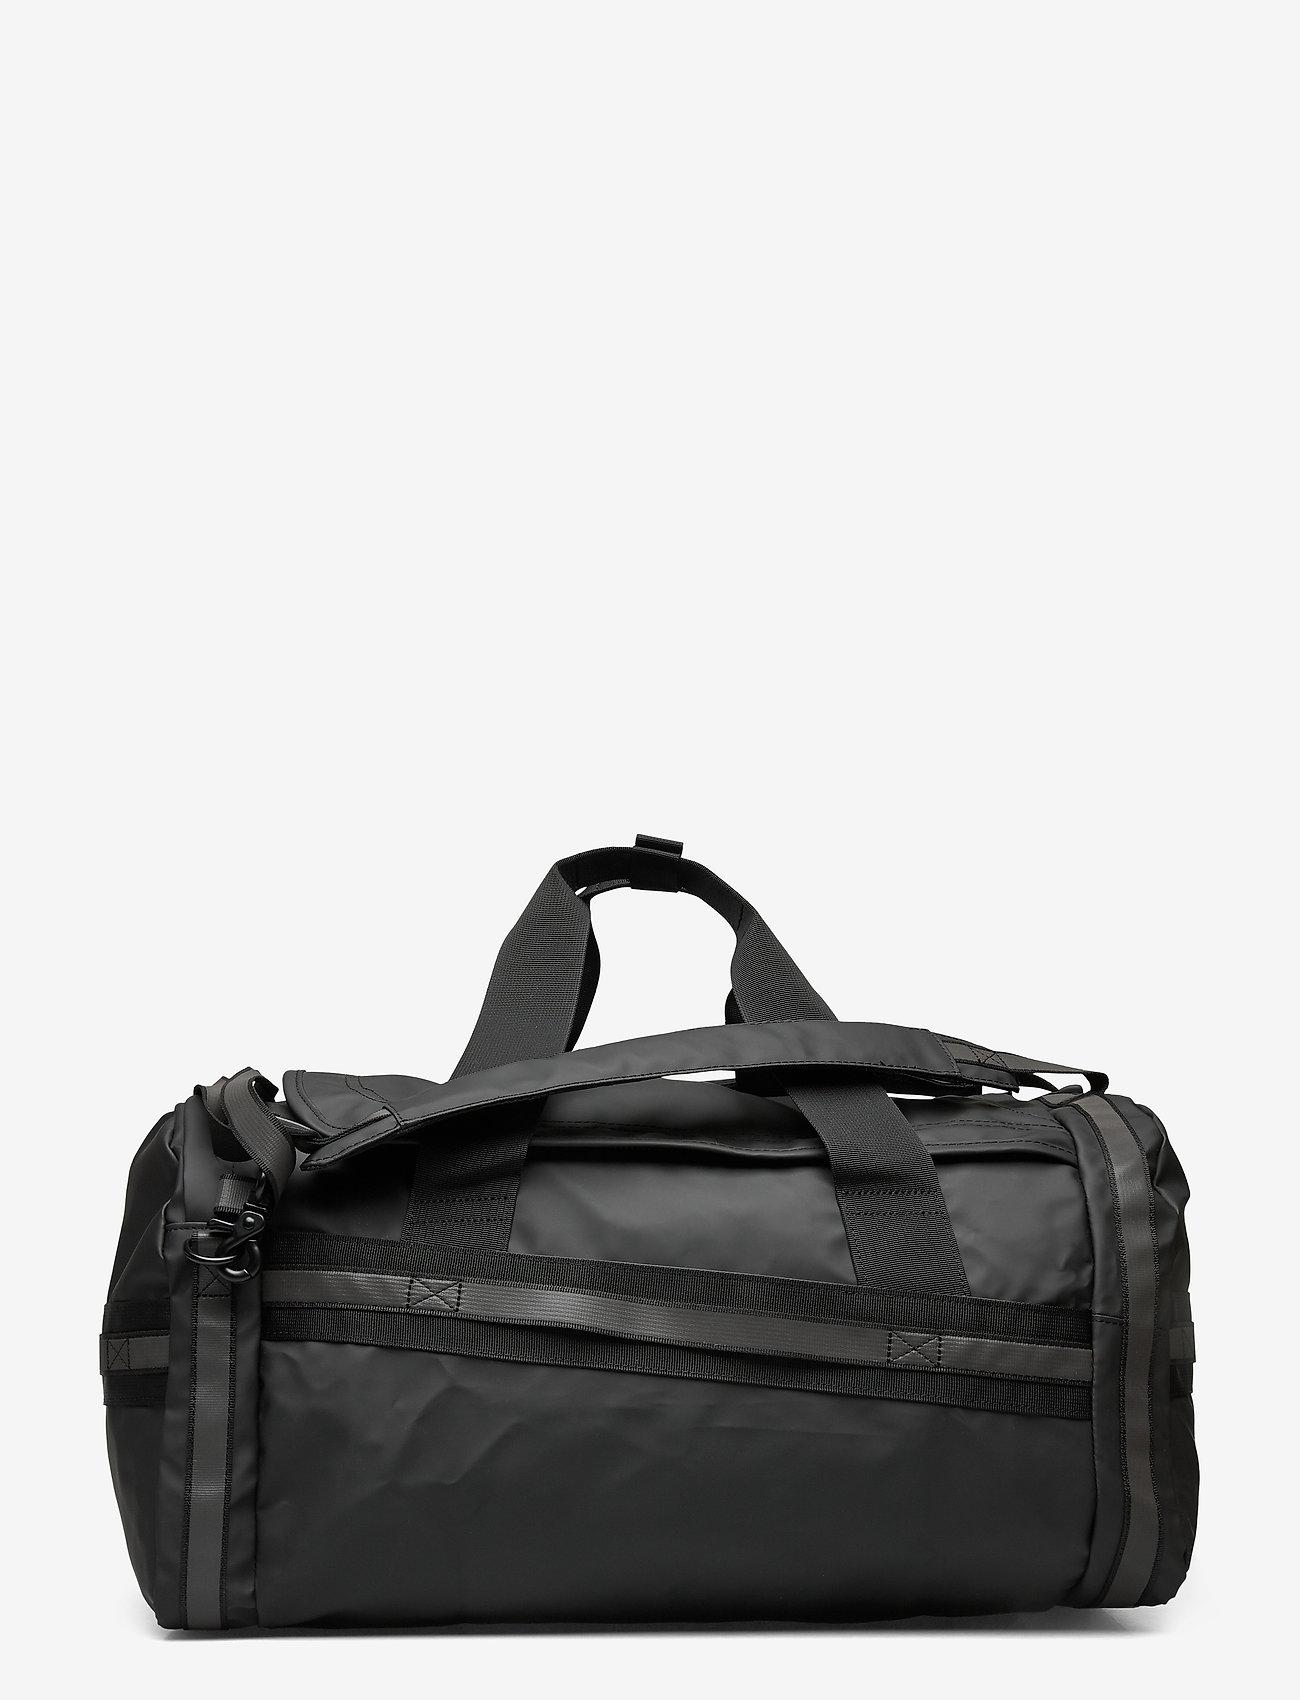 SANDQVIST - LEOPOLD - weekend bags - black - 1